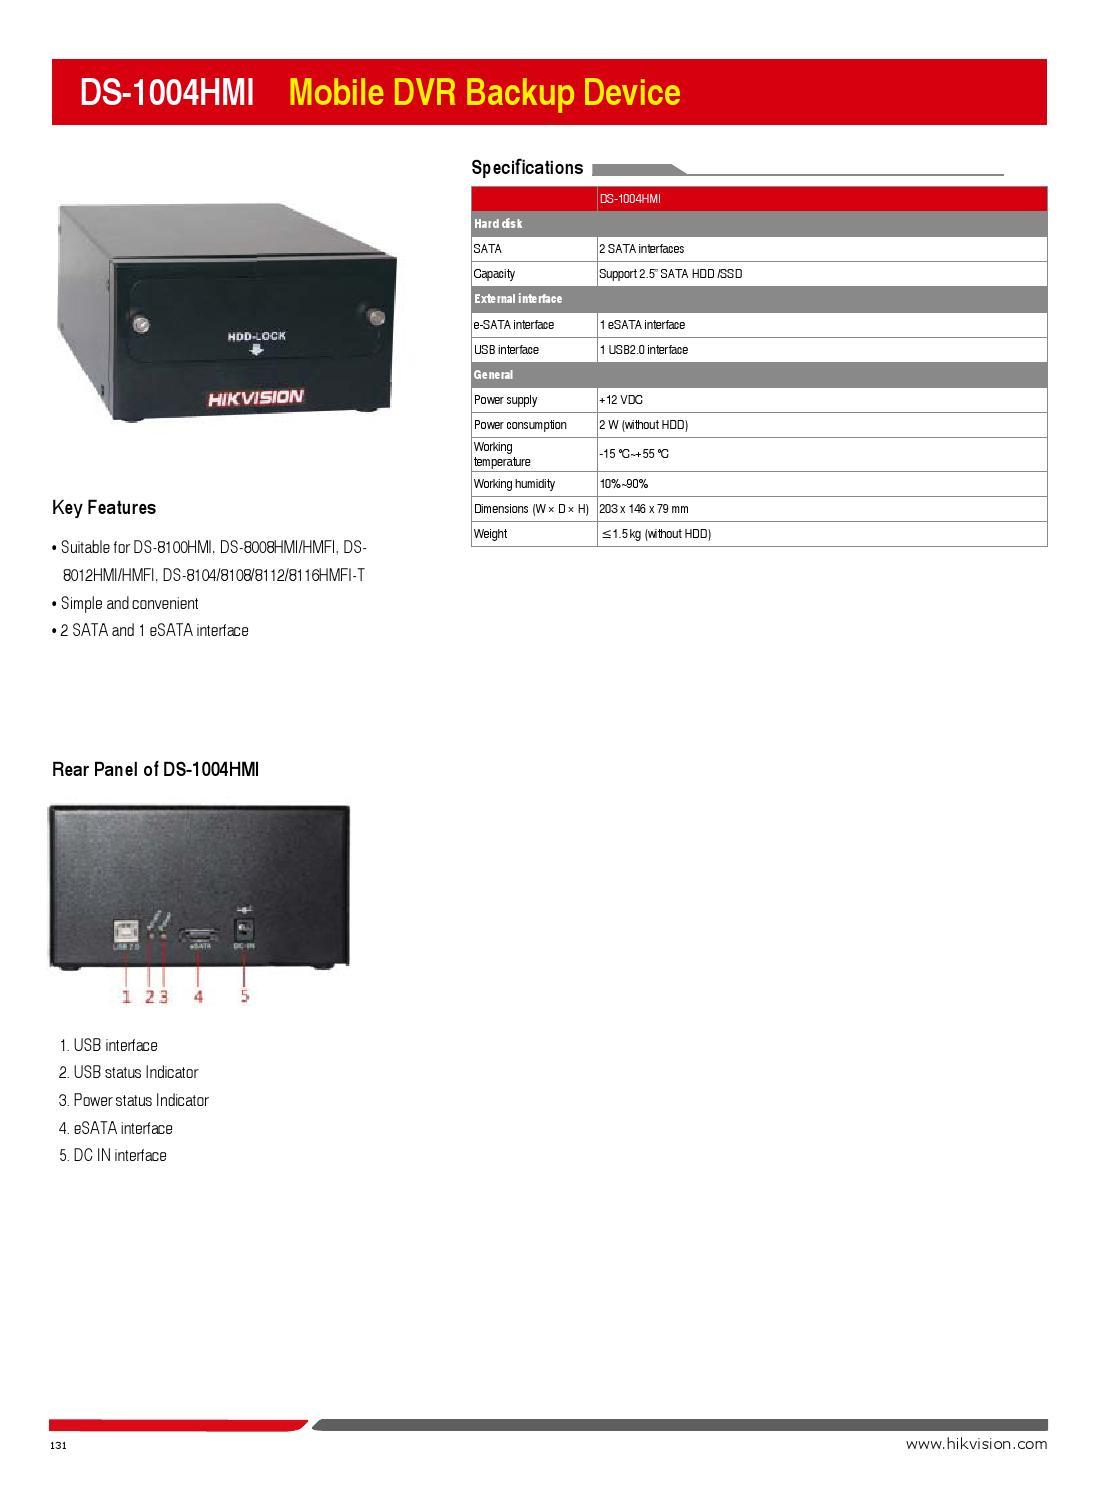 Hikvision product catalog by Balogh János - issuu